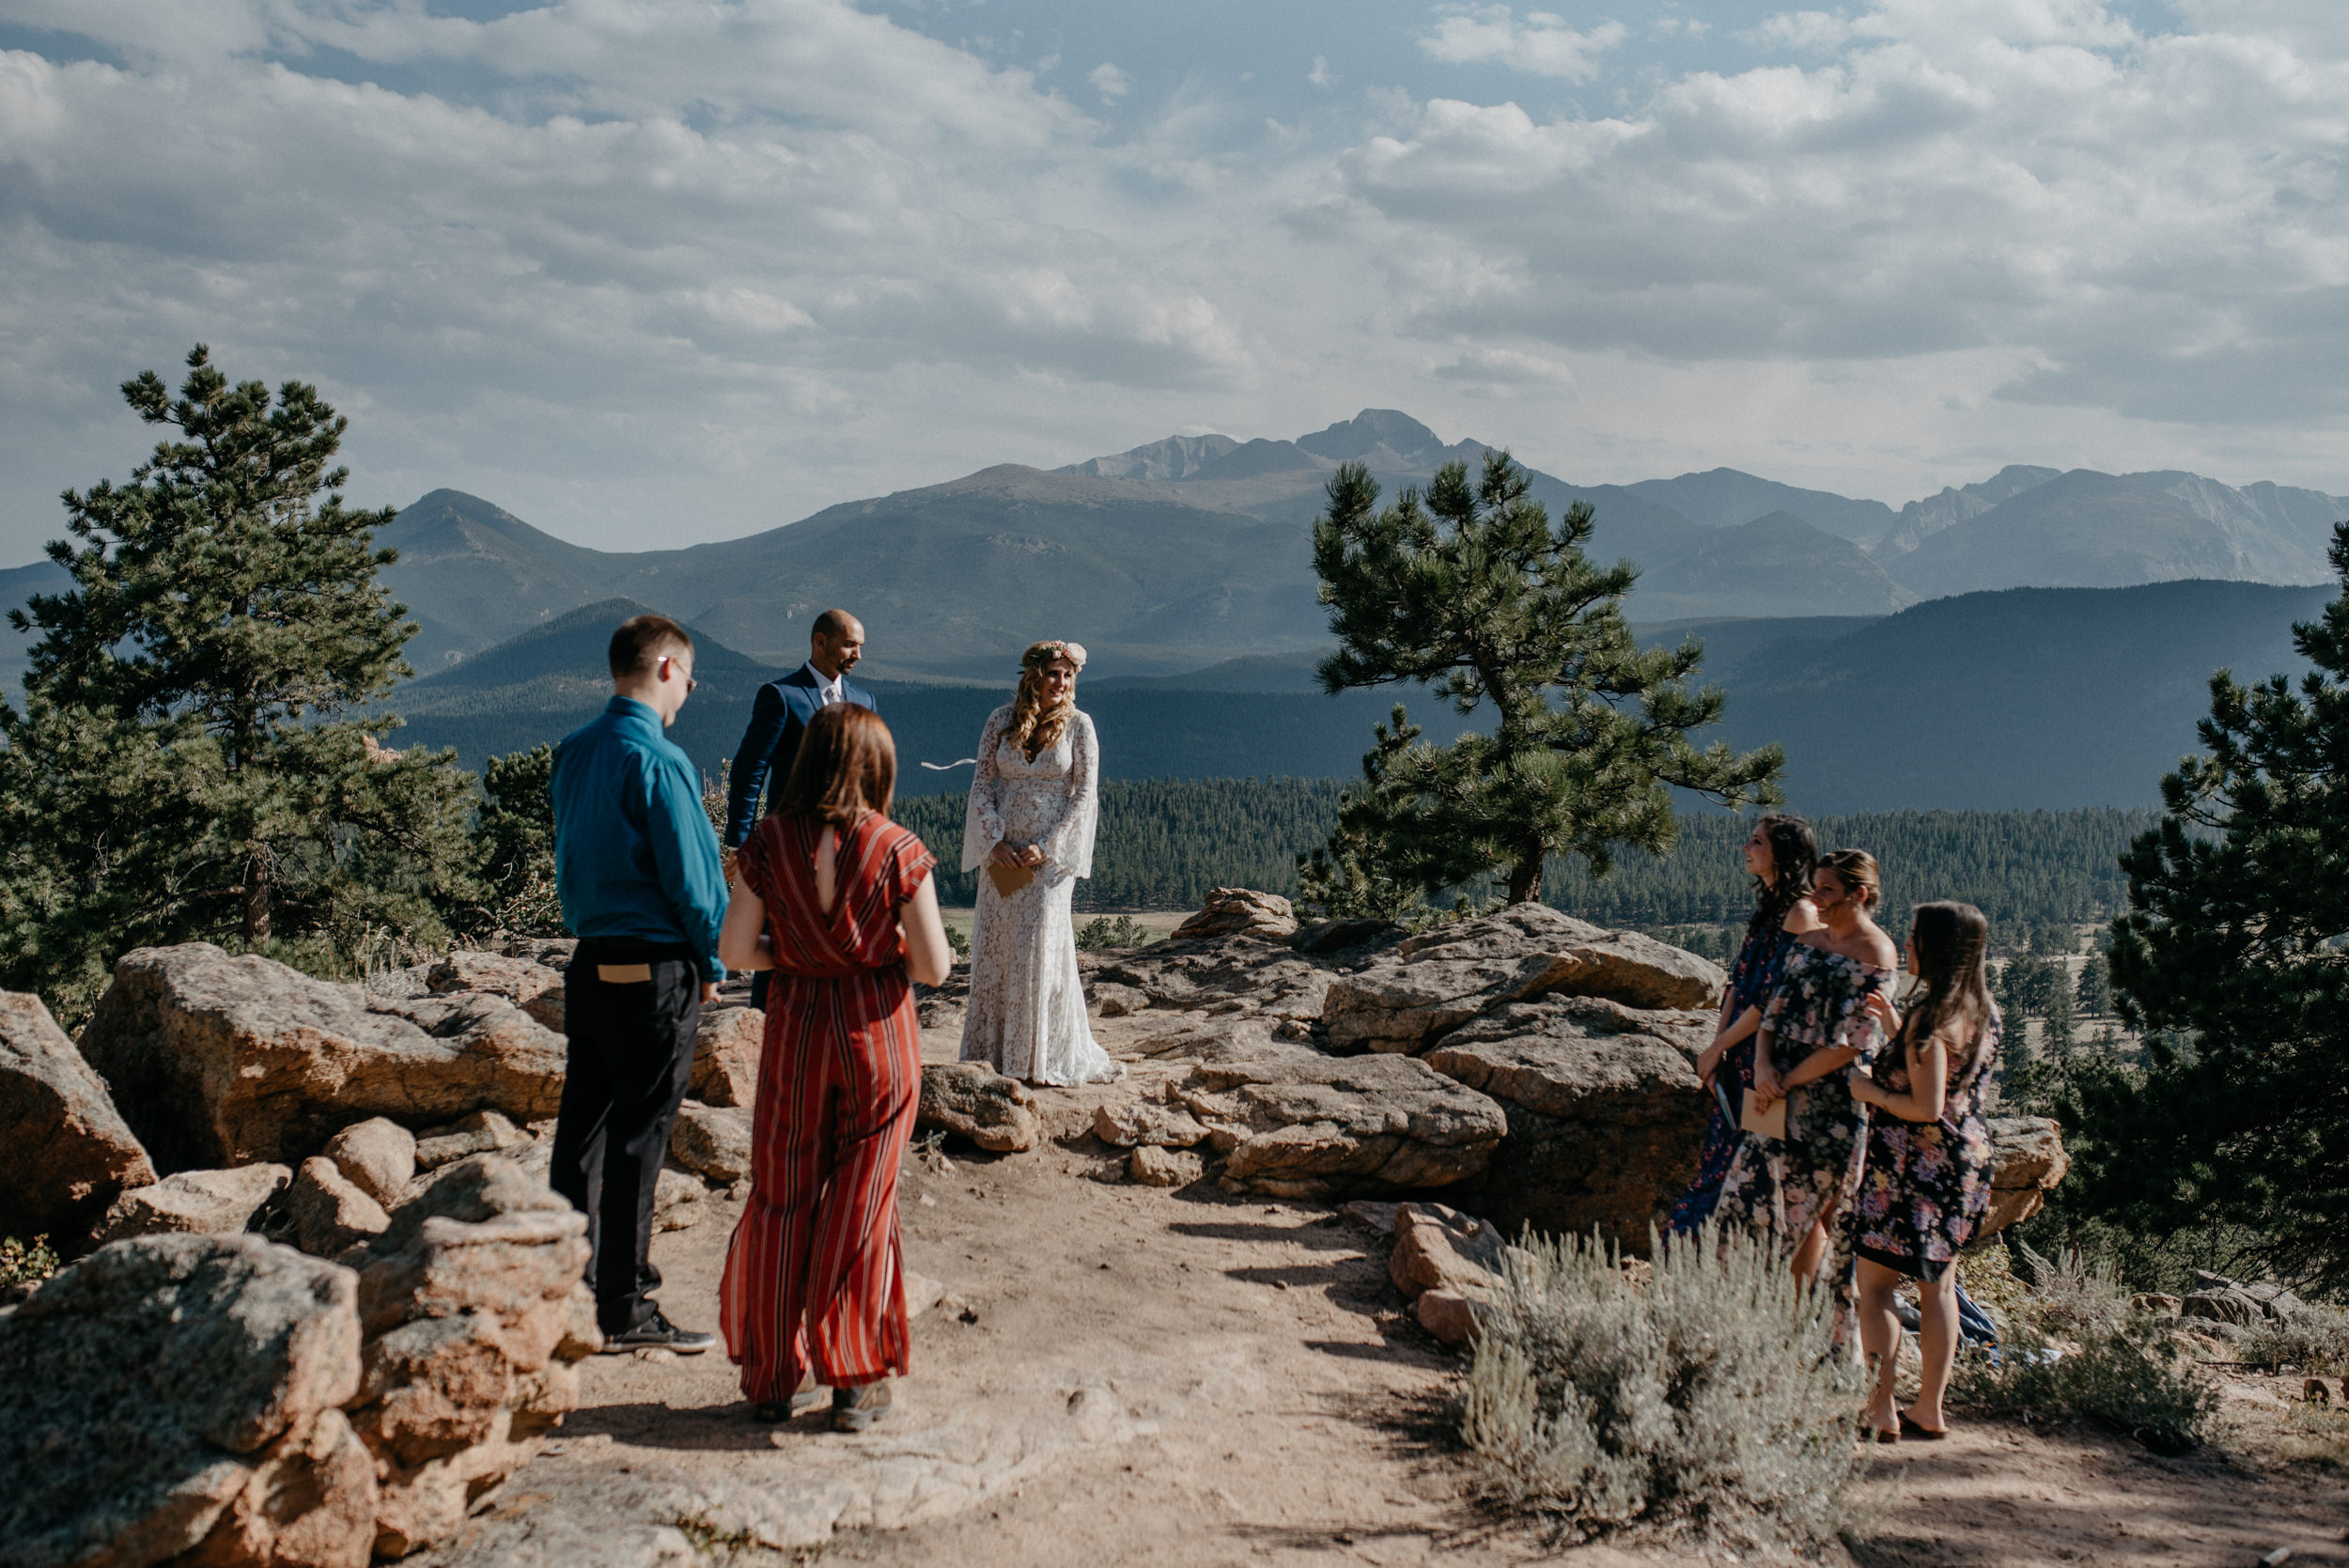 Colorado intimate wedding and elopement photographer. Estes Park elopement at 3M curve.